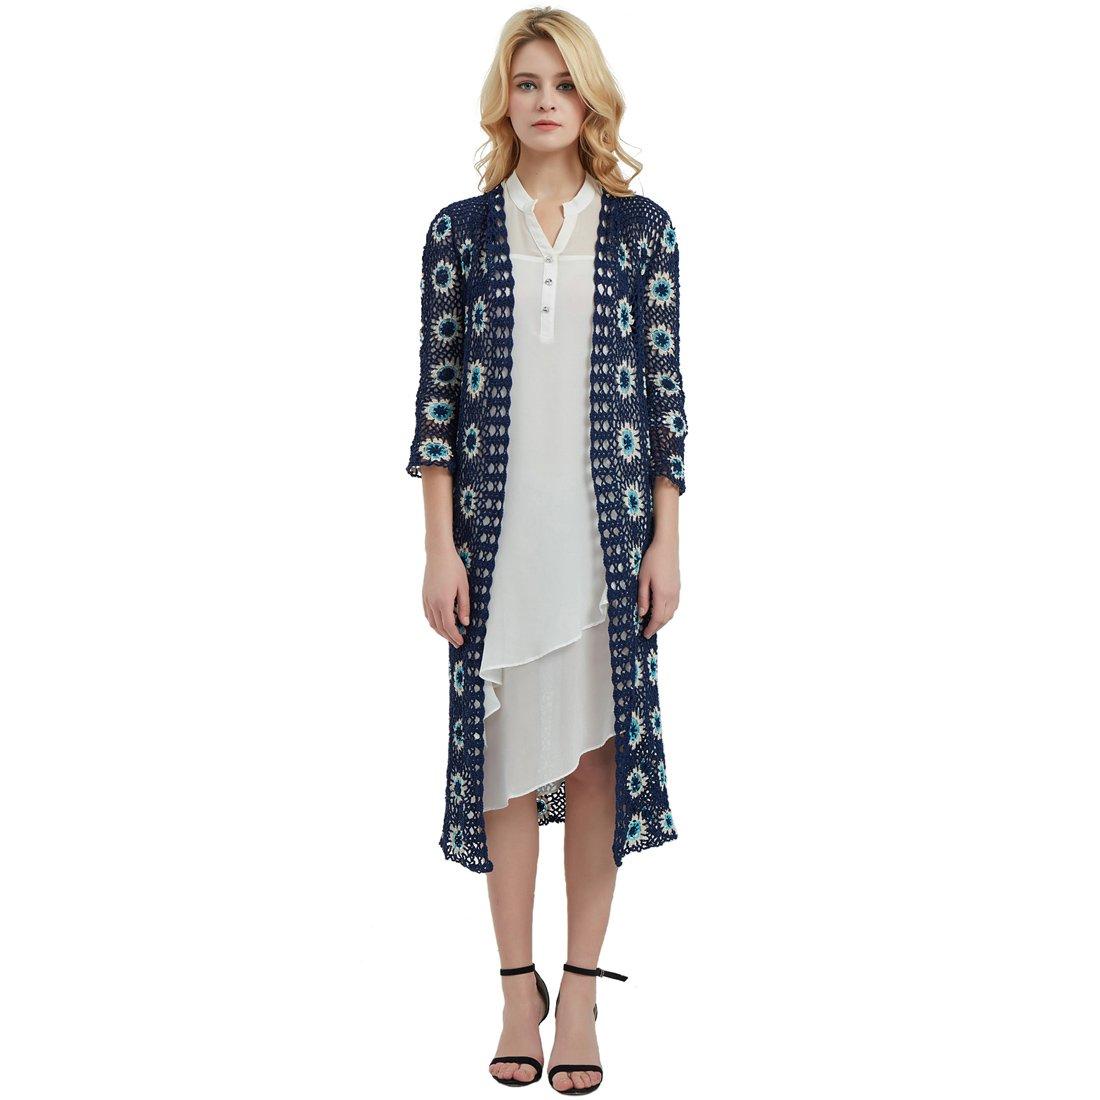 ZORJAR 100% Handmade Long Open Front Women's Crochet Cardigan Top